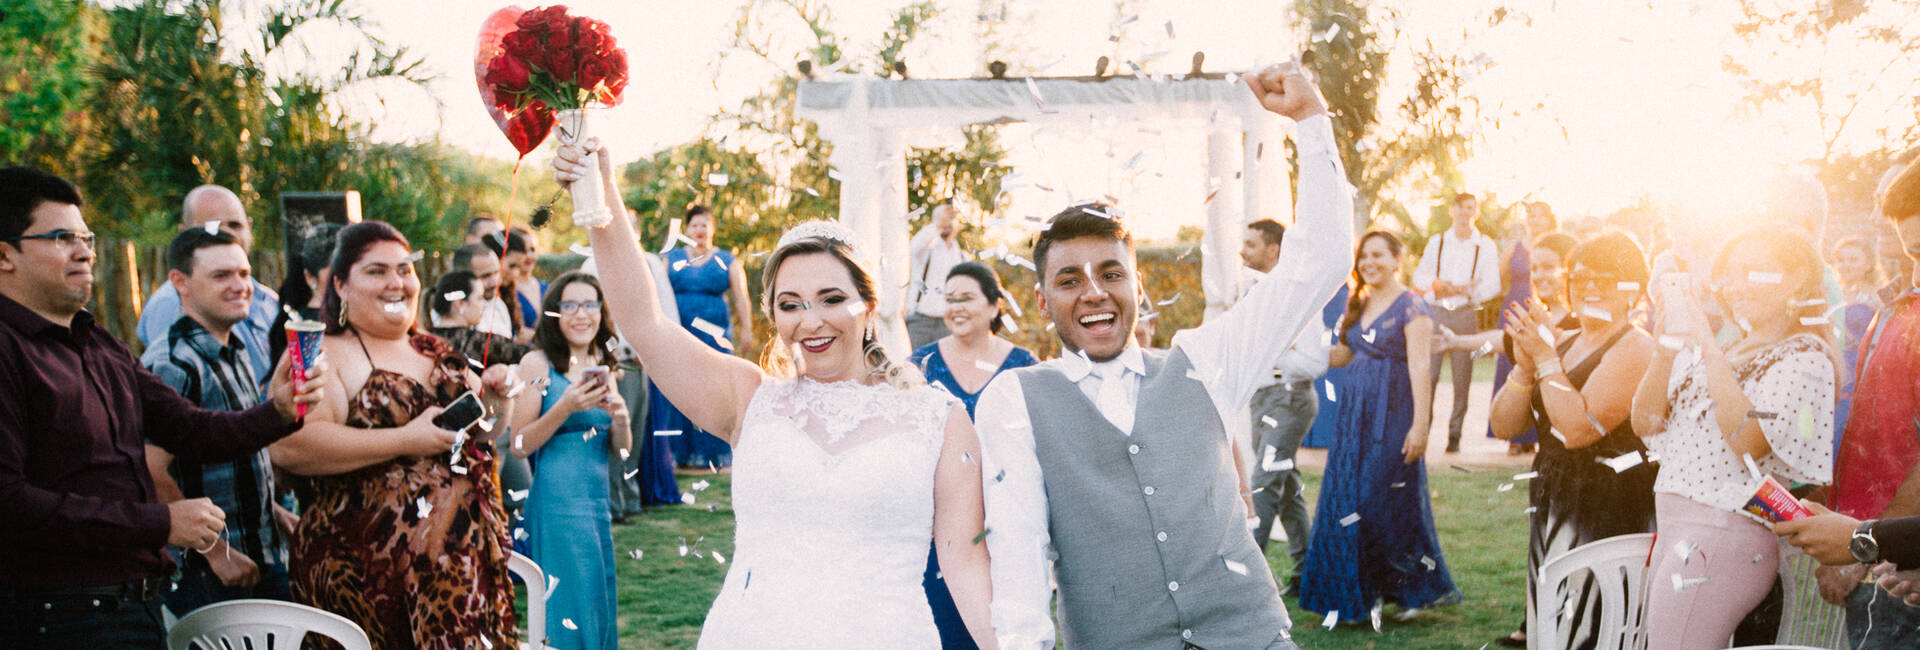 Casamento de Glaucia & Patrício